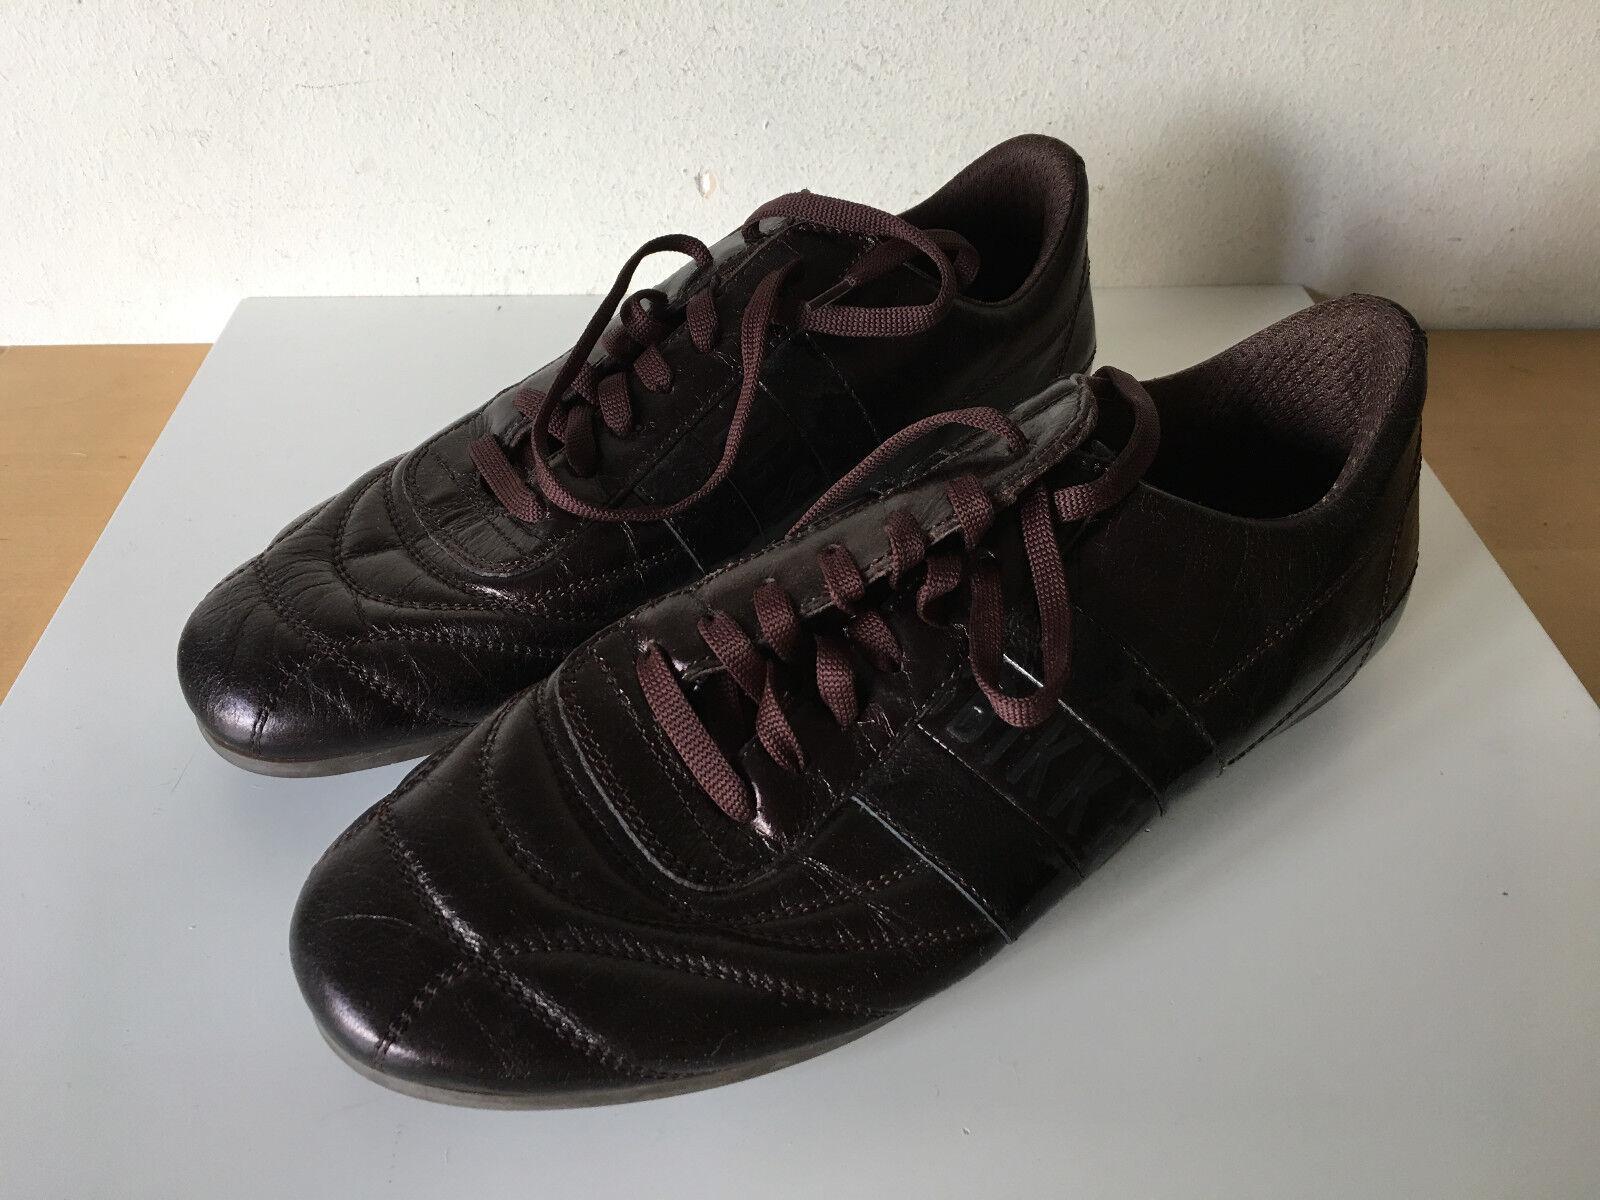 LITTLE LITTLE LITTLE Used - Sport zapatos BIKKEMBERGS Zapatos Deportivos - Dark marrón - Nº 40  barato y de alta calidad